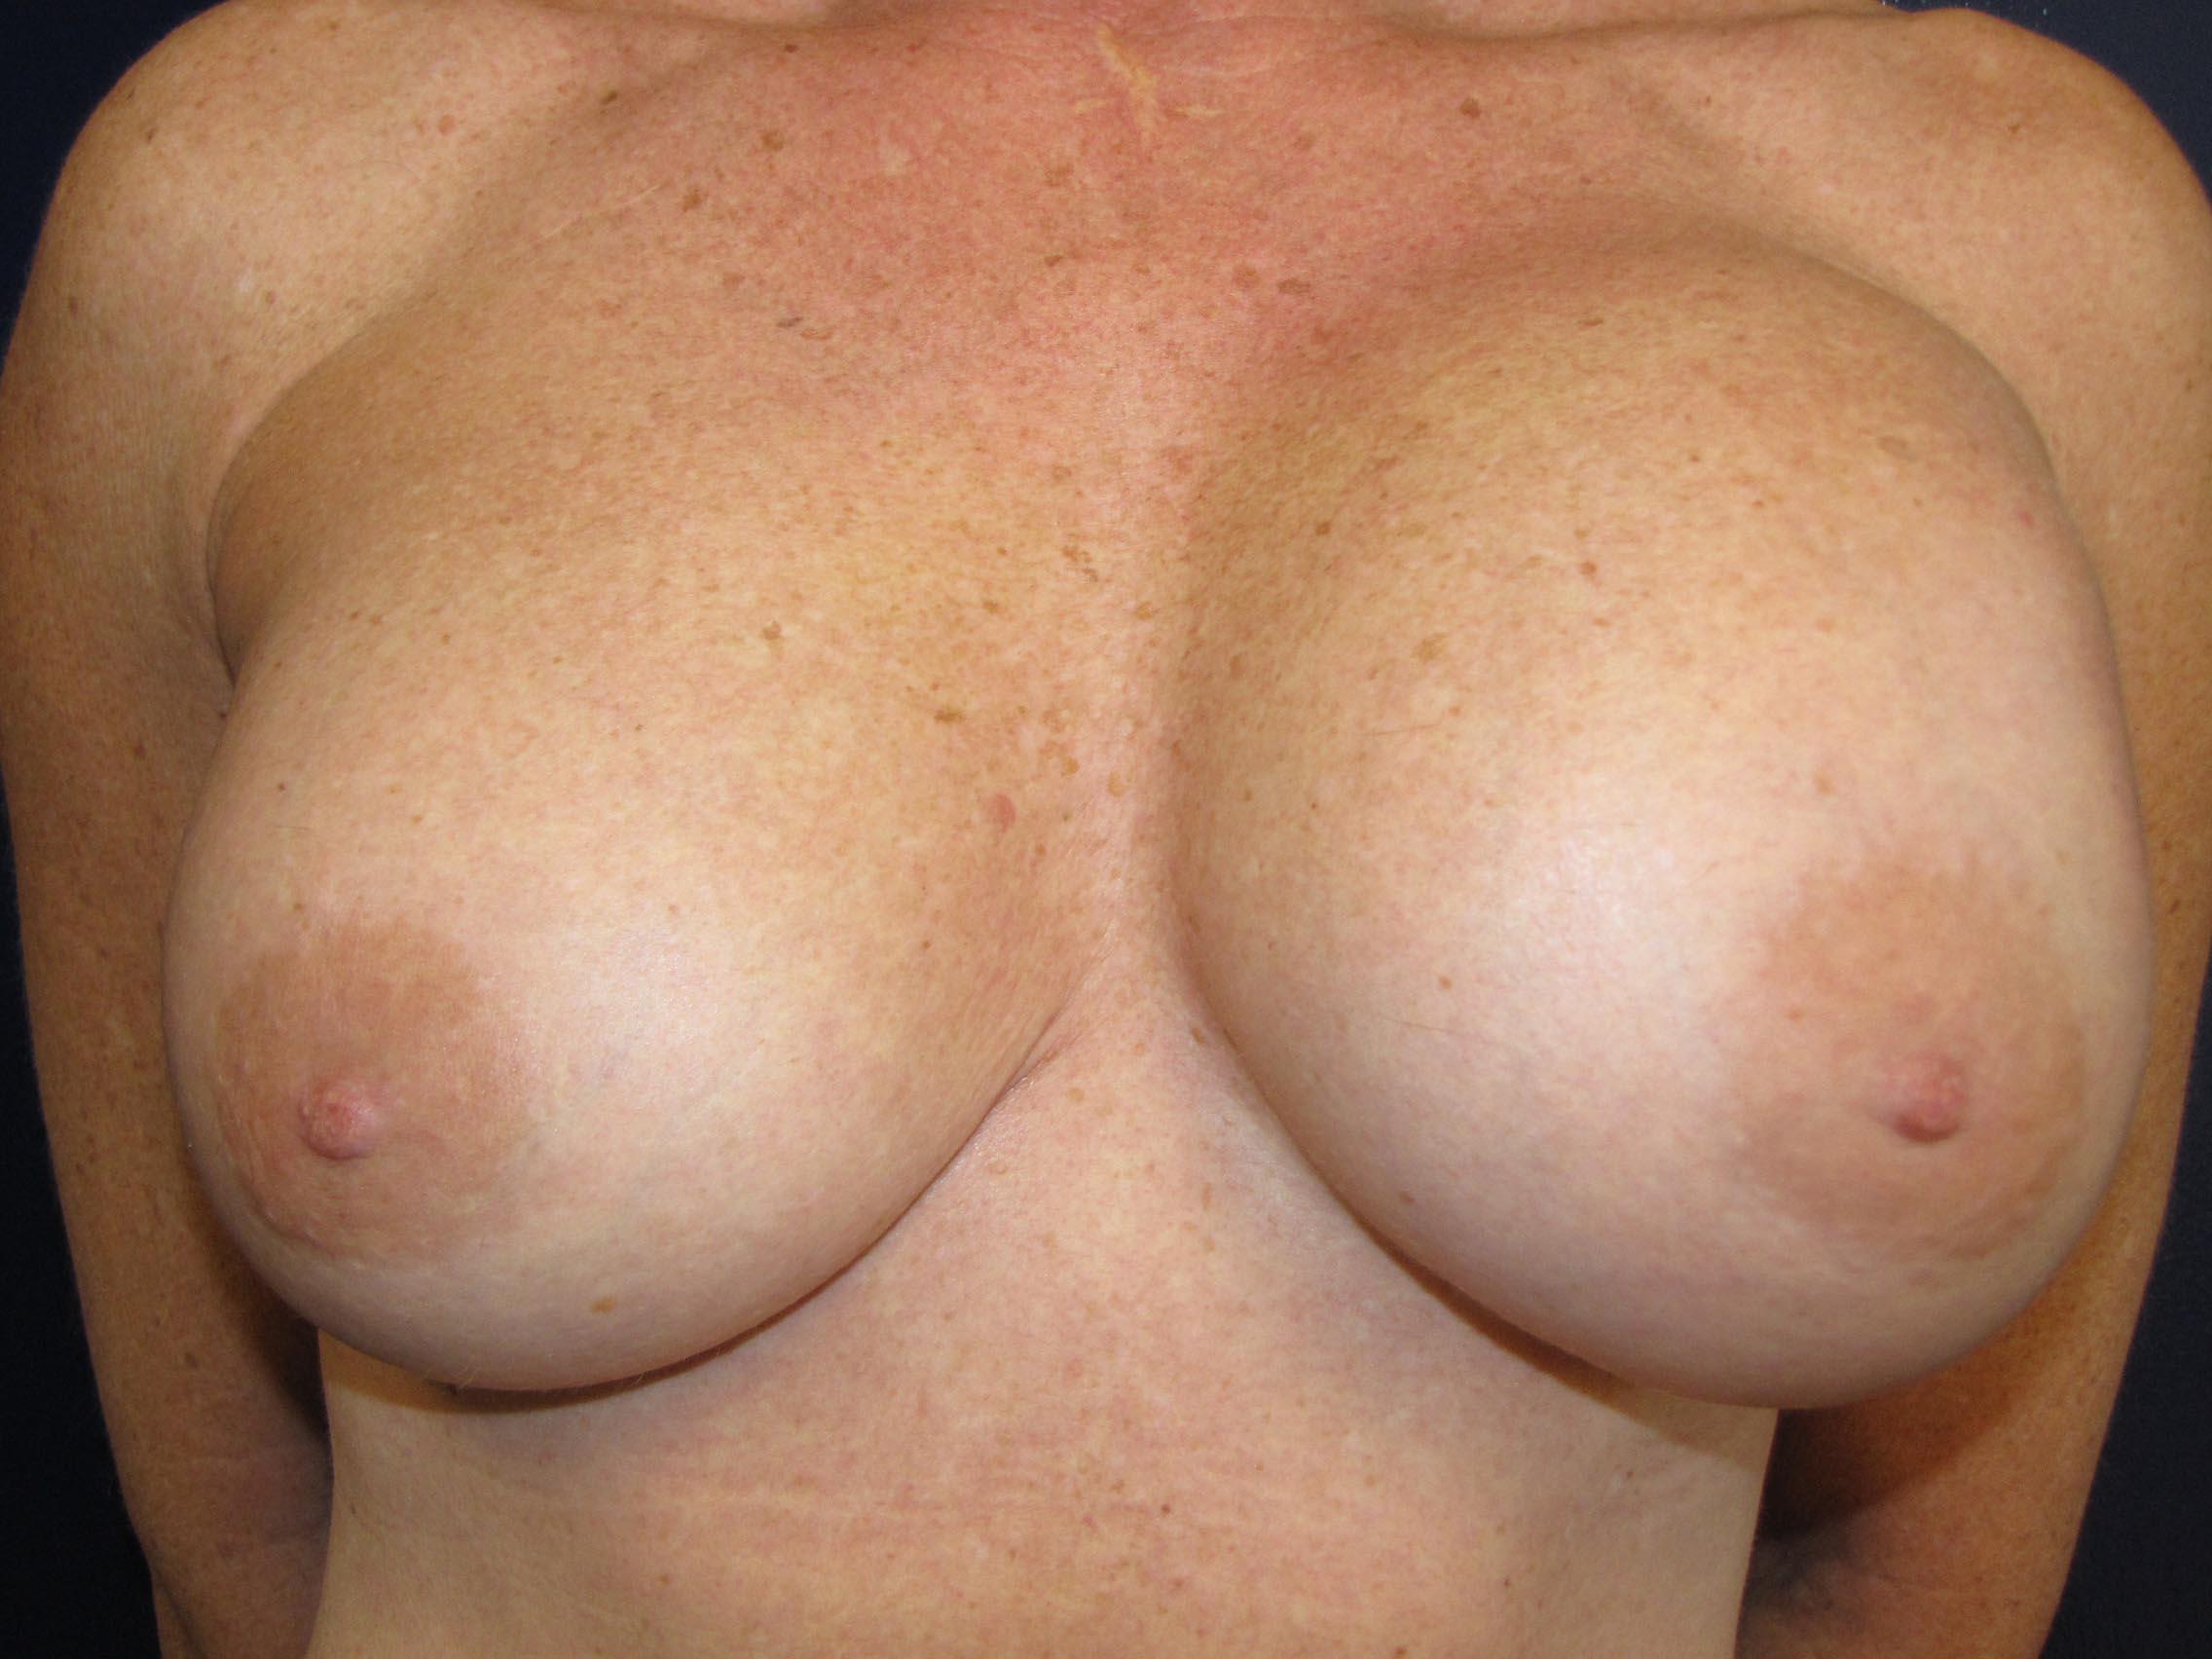 Breast implant ruptured agree